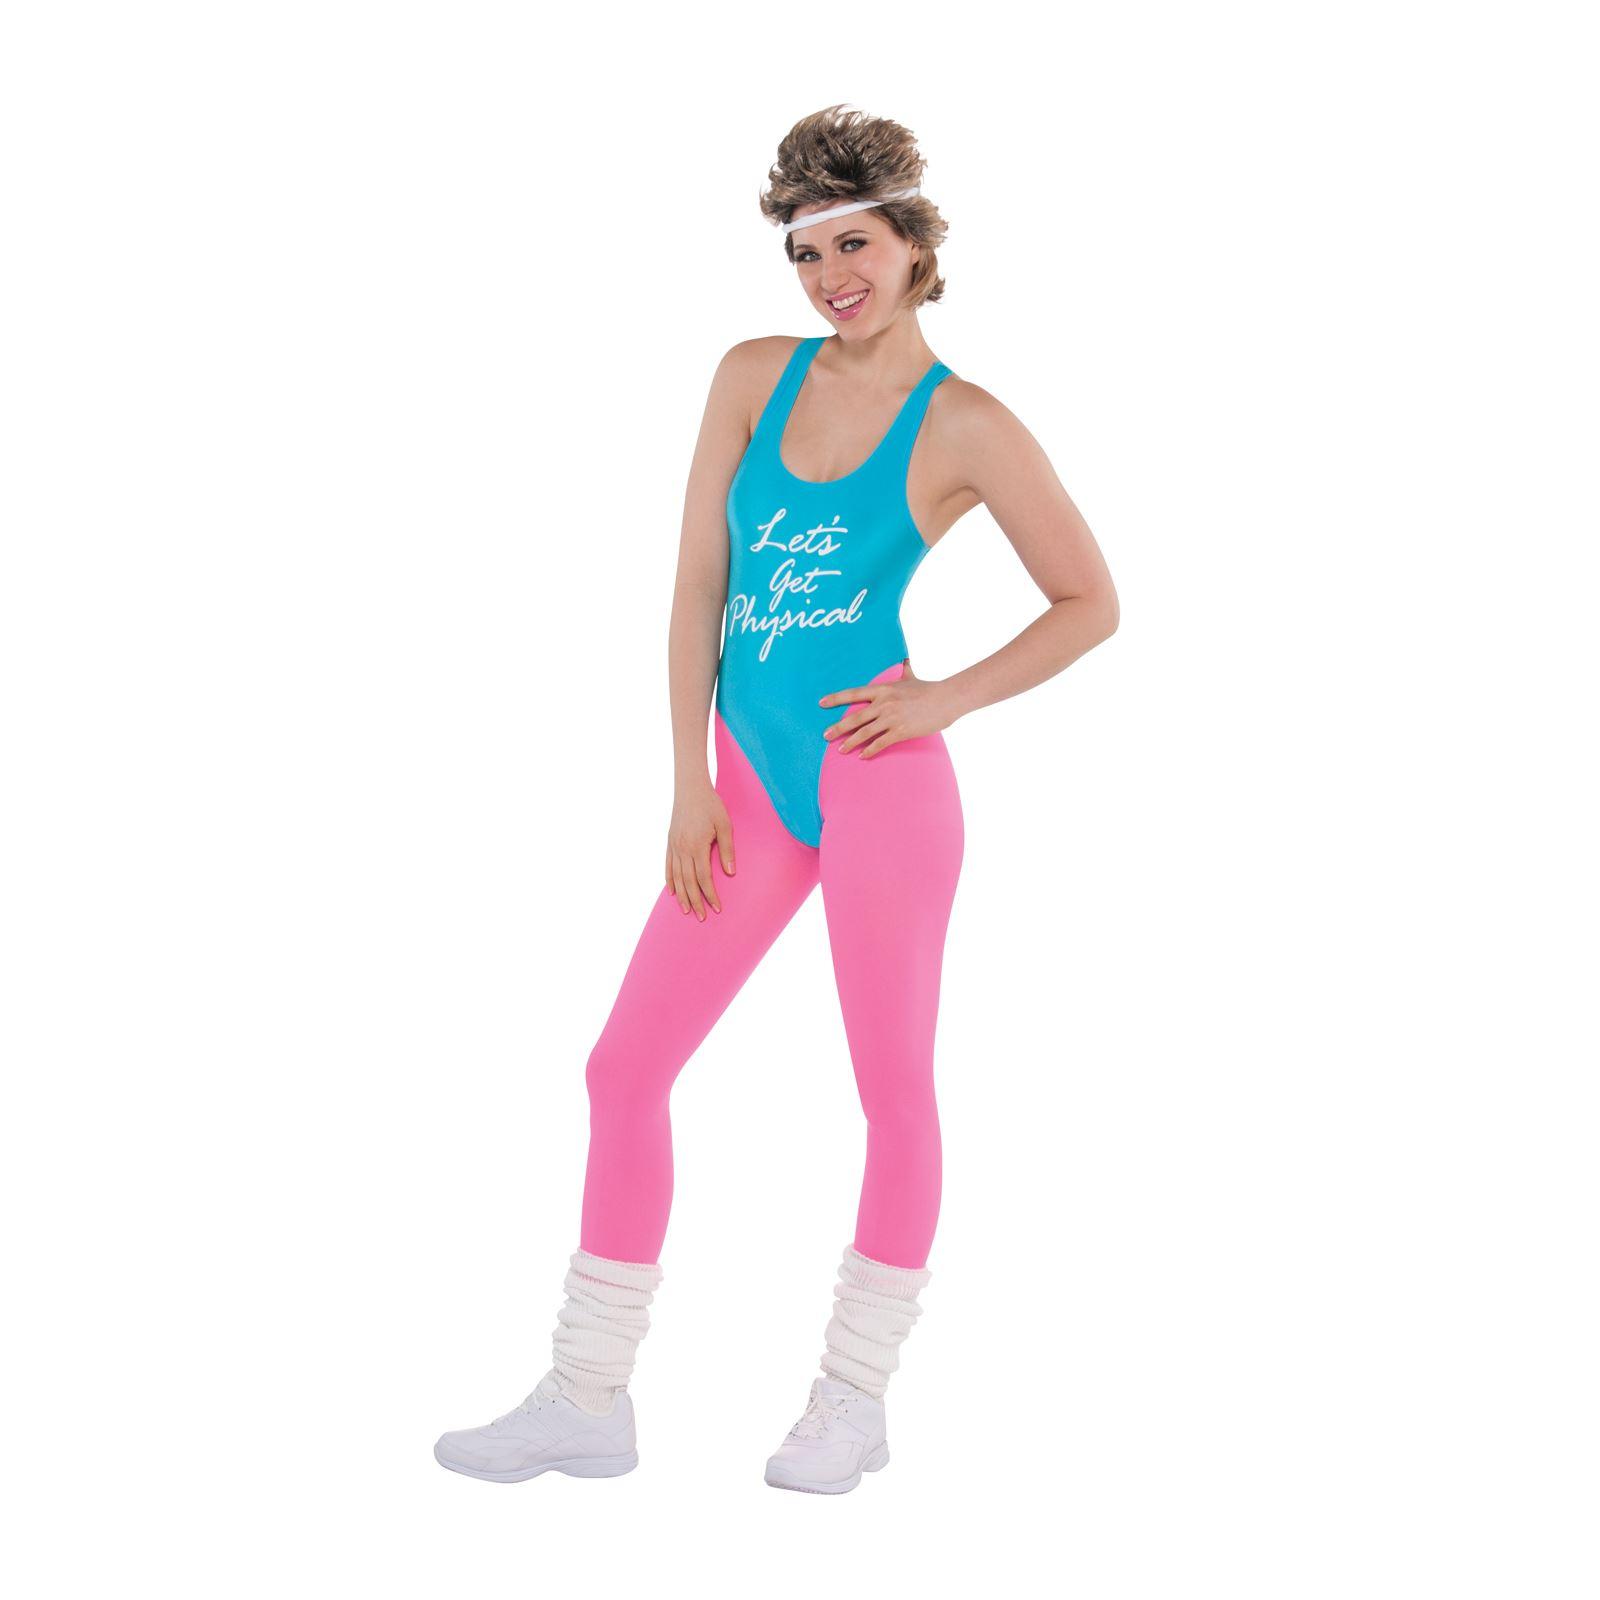 80er Jahre Lets Get Physical Damenkostüm Sport Training Trikot Kostüm Outfit